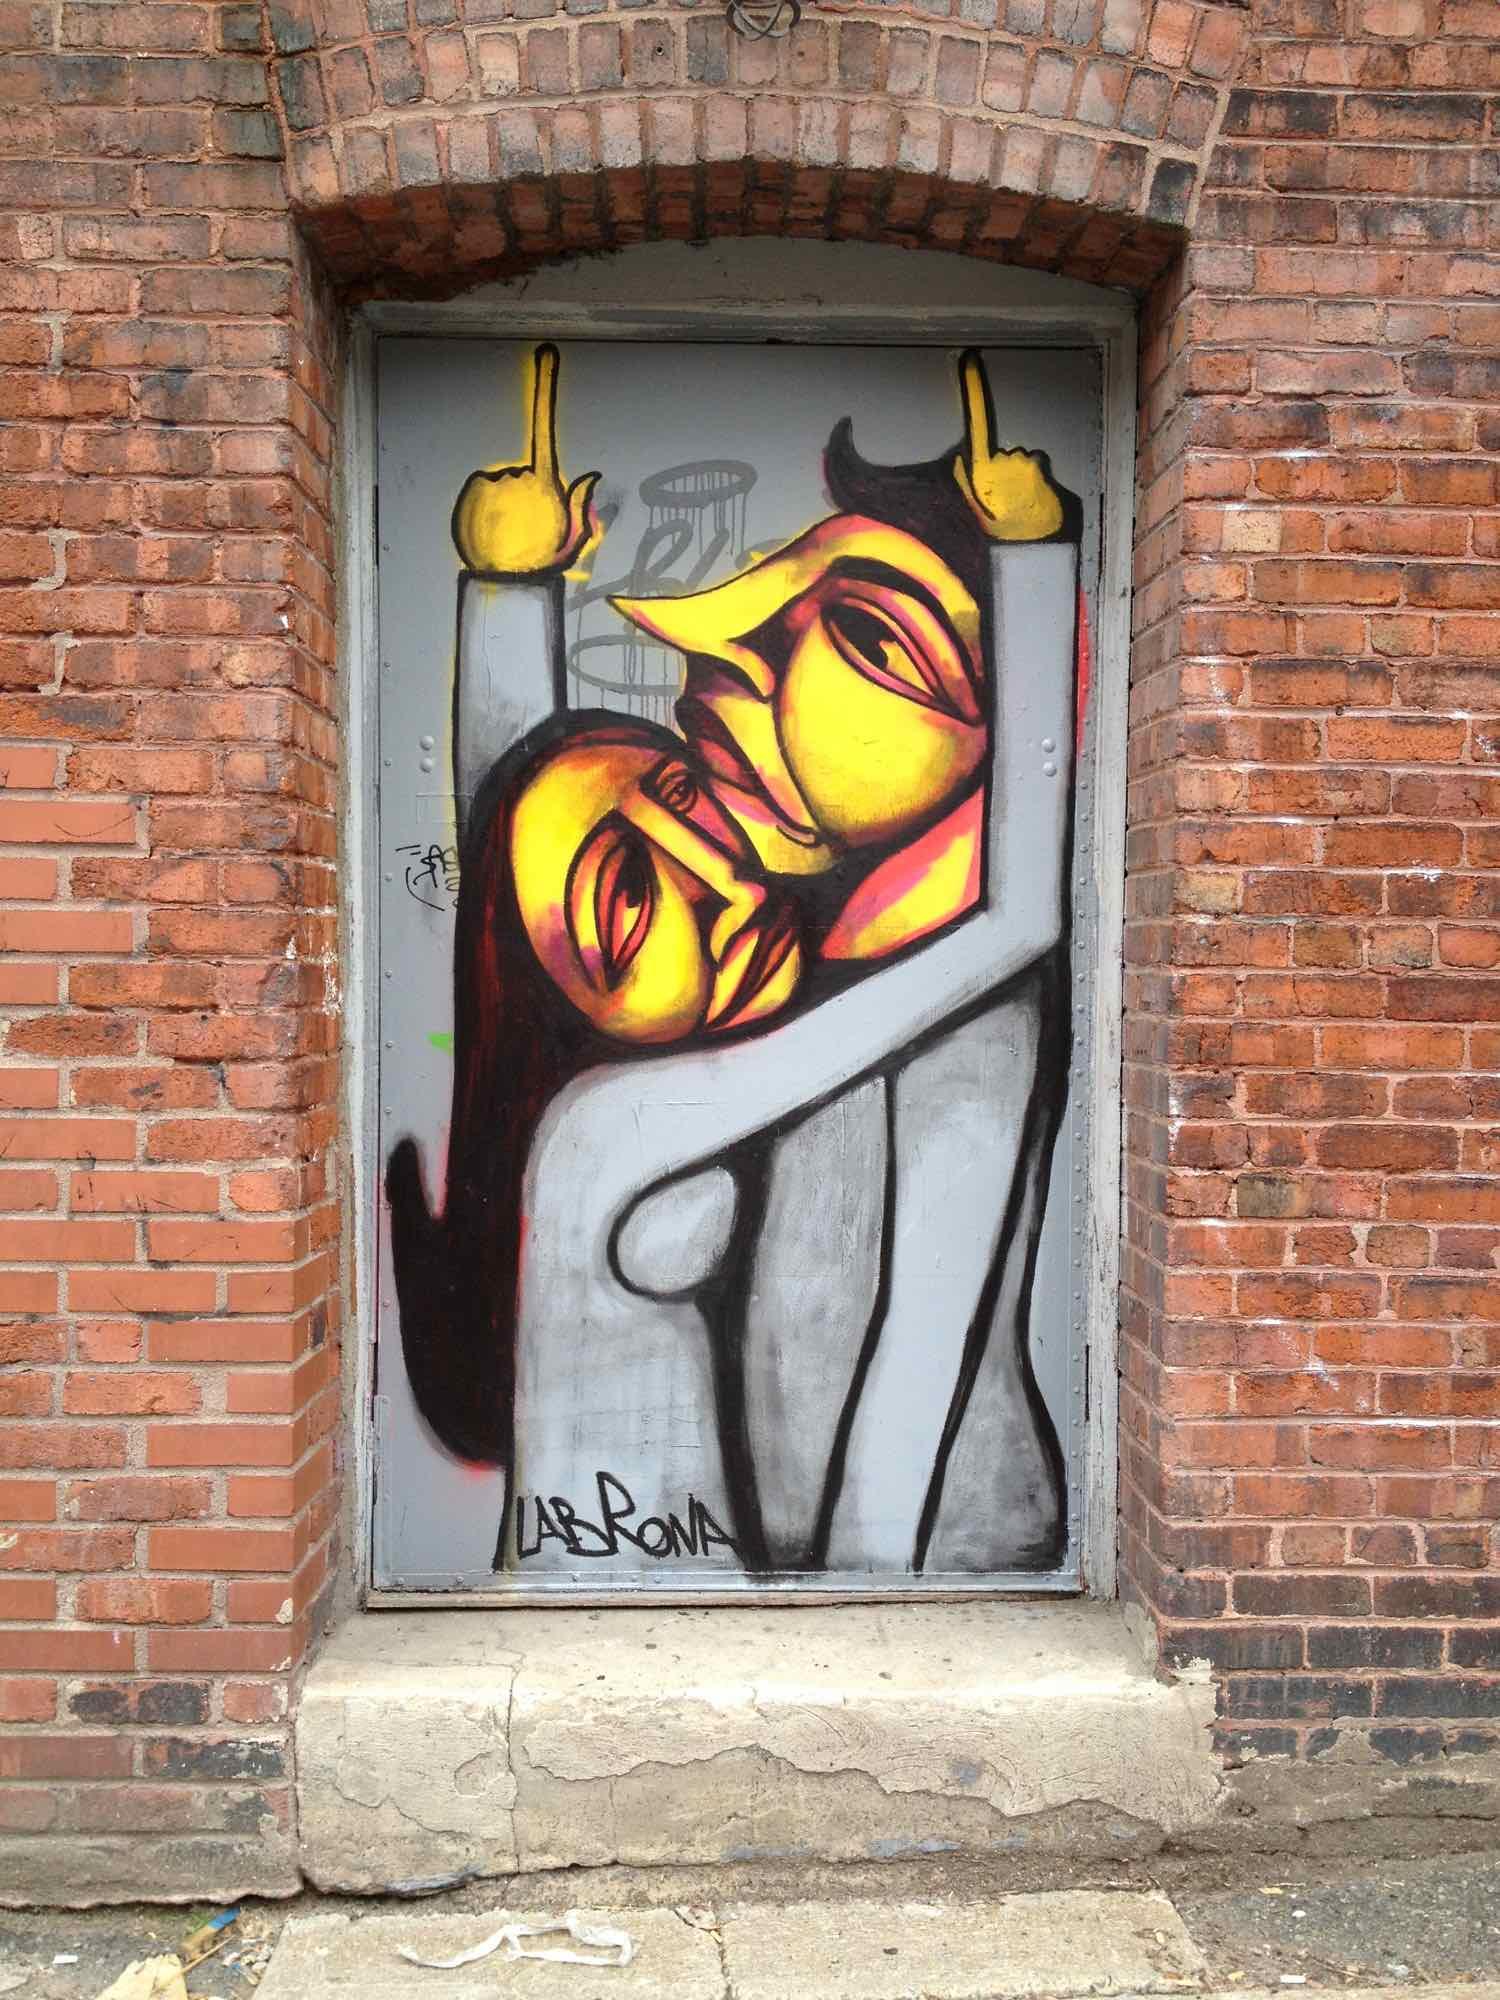 The_Walls_Of_Montreal-Ezra_Soiferman - 37.jpg